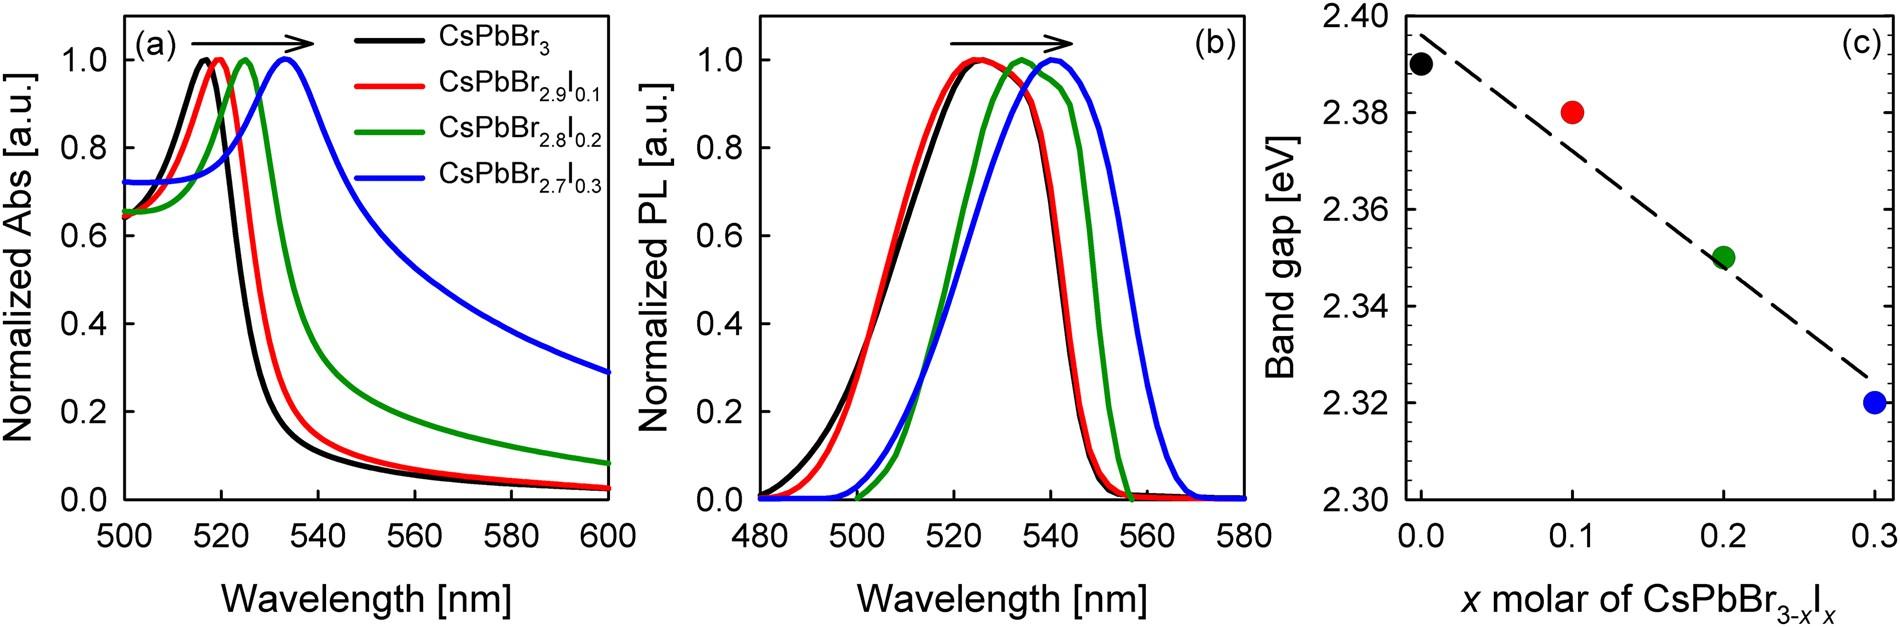 Tunable Open Circuit Voltage By Engineering Inorganic Cesium Lead Simple Diagram Back To Detector Bromide Iodide Perovskite Solar Cells Scientific Reports